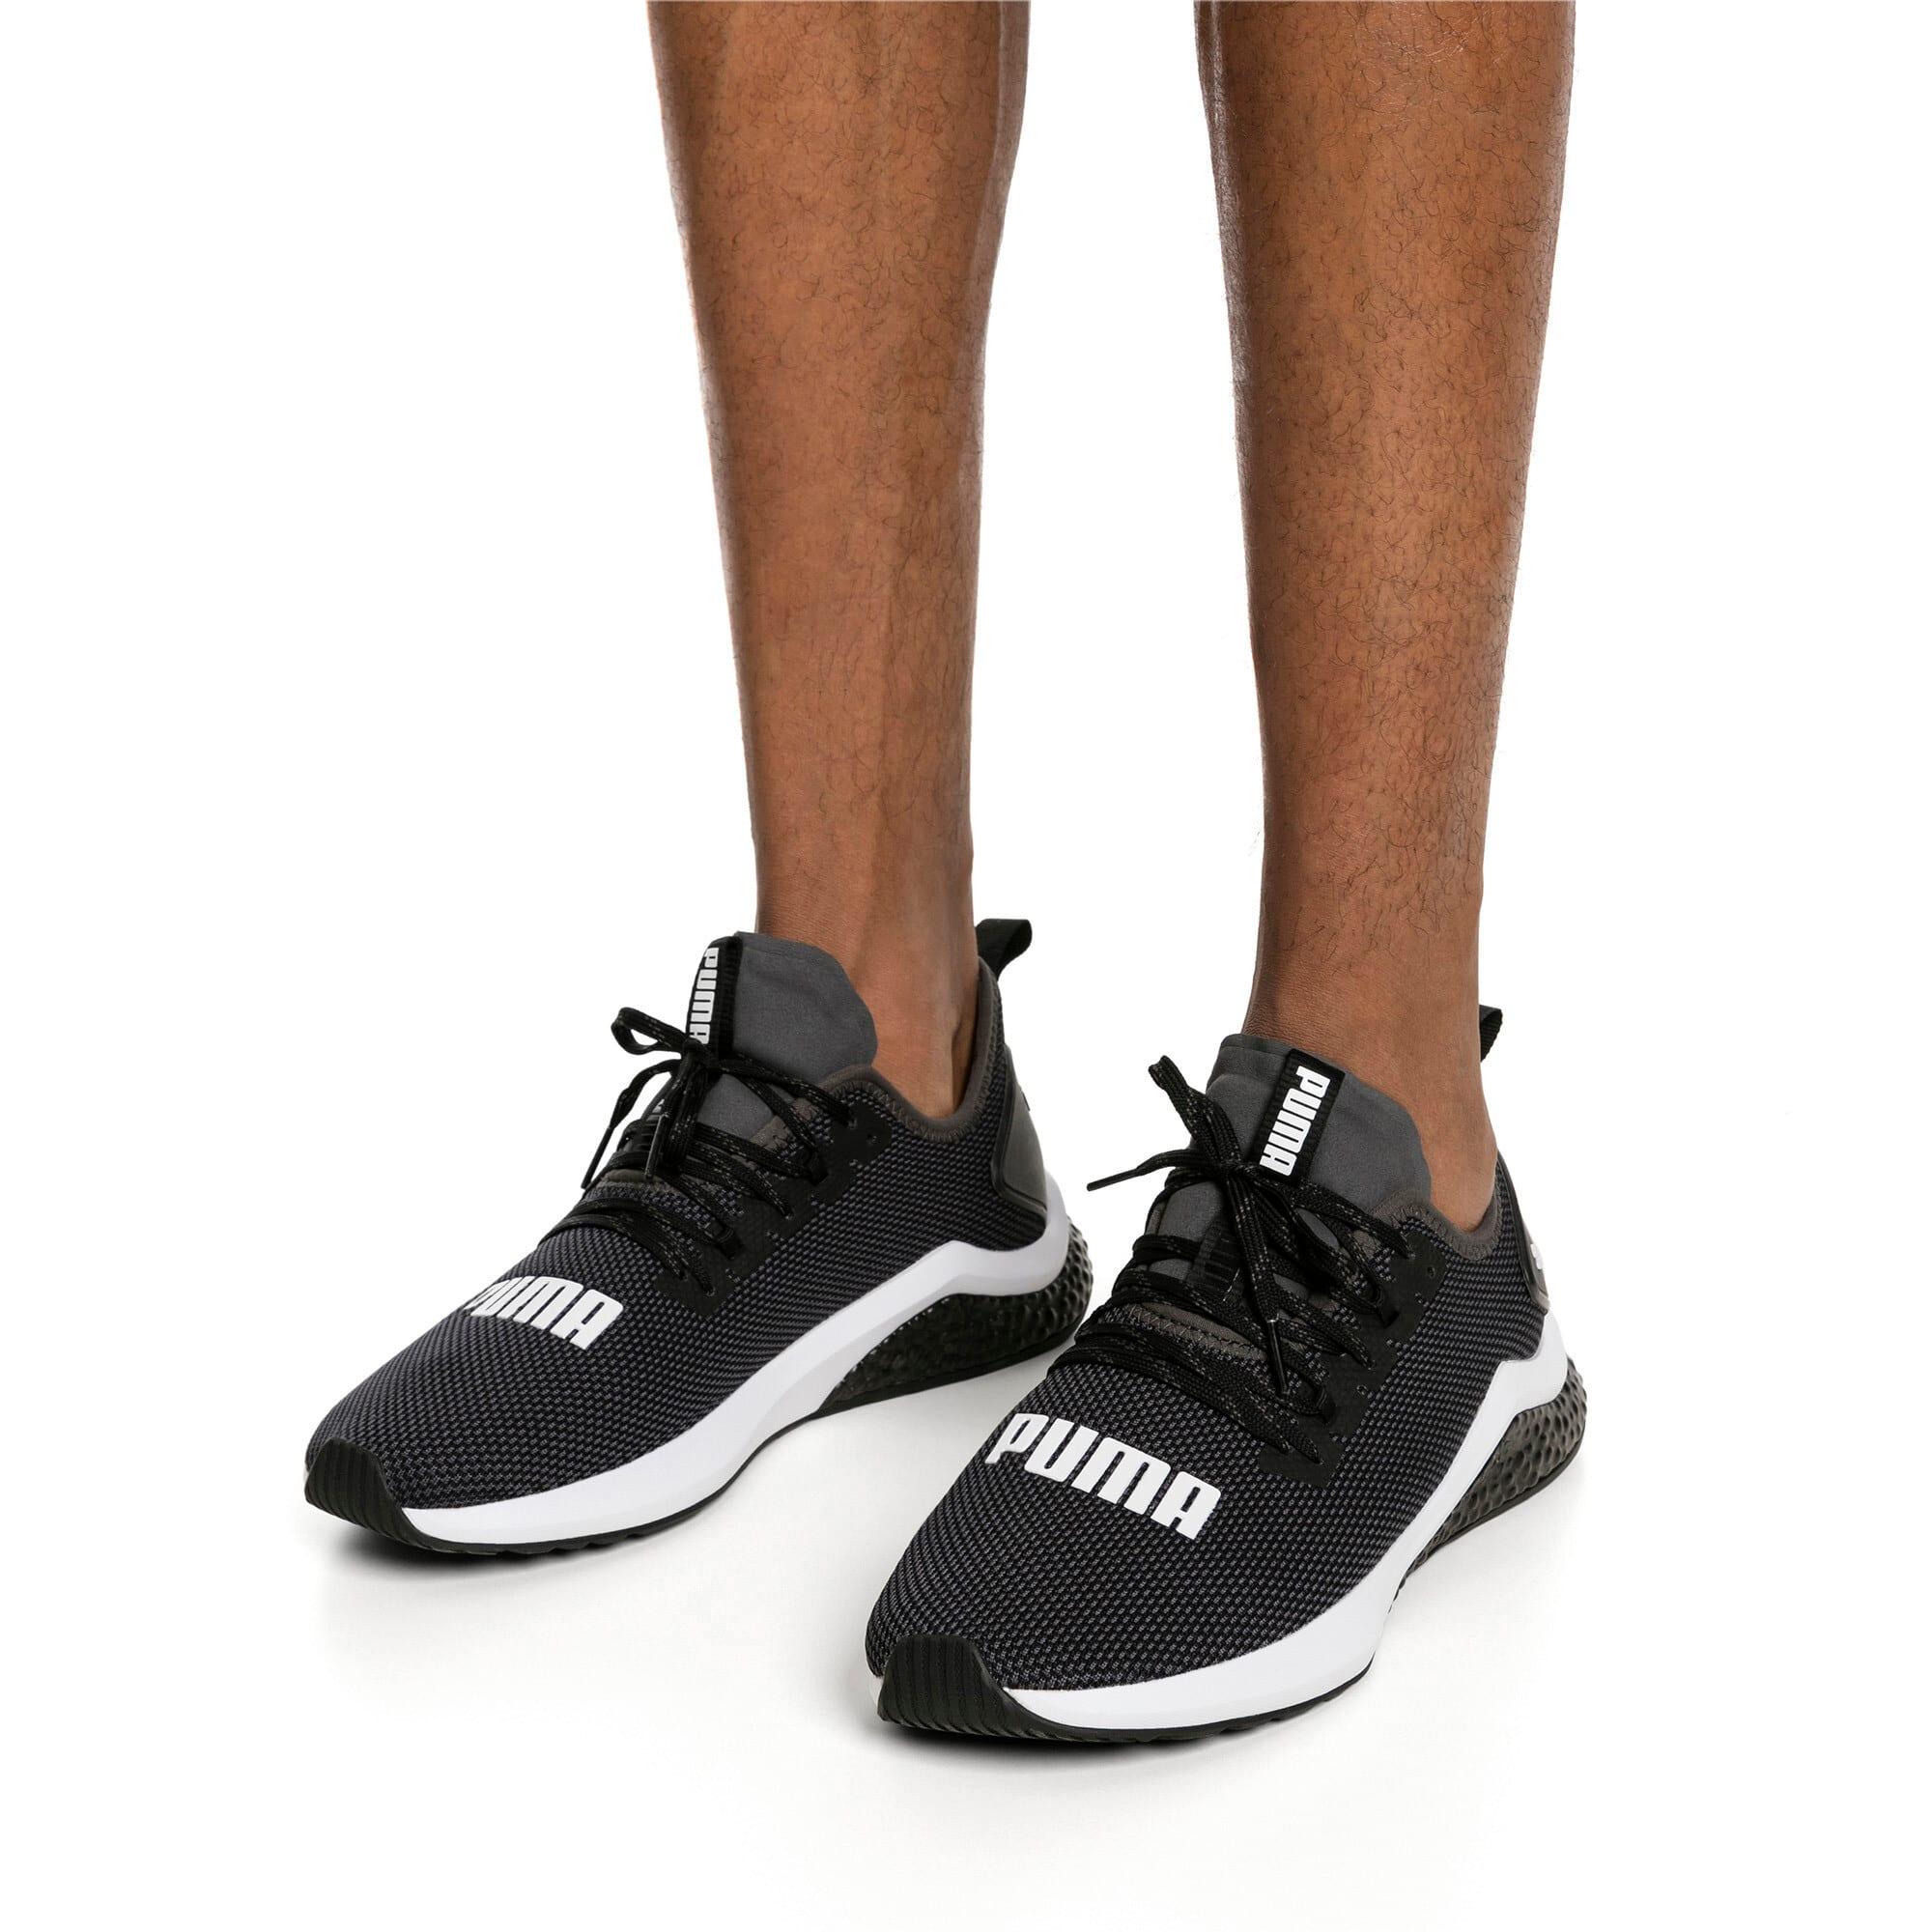 Thumbnail 2 of HYBRID NX hardloopschoenen voor heren, Puma Black-Puma White, medium